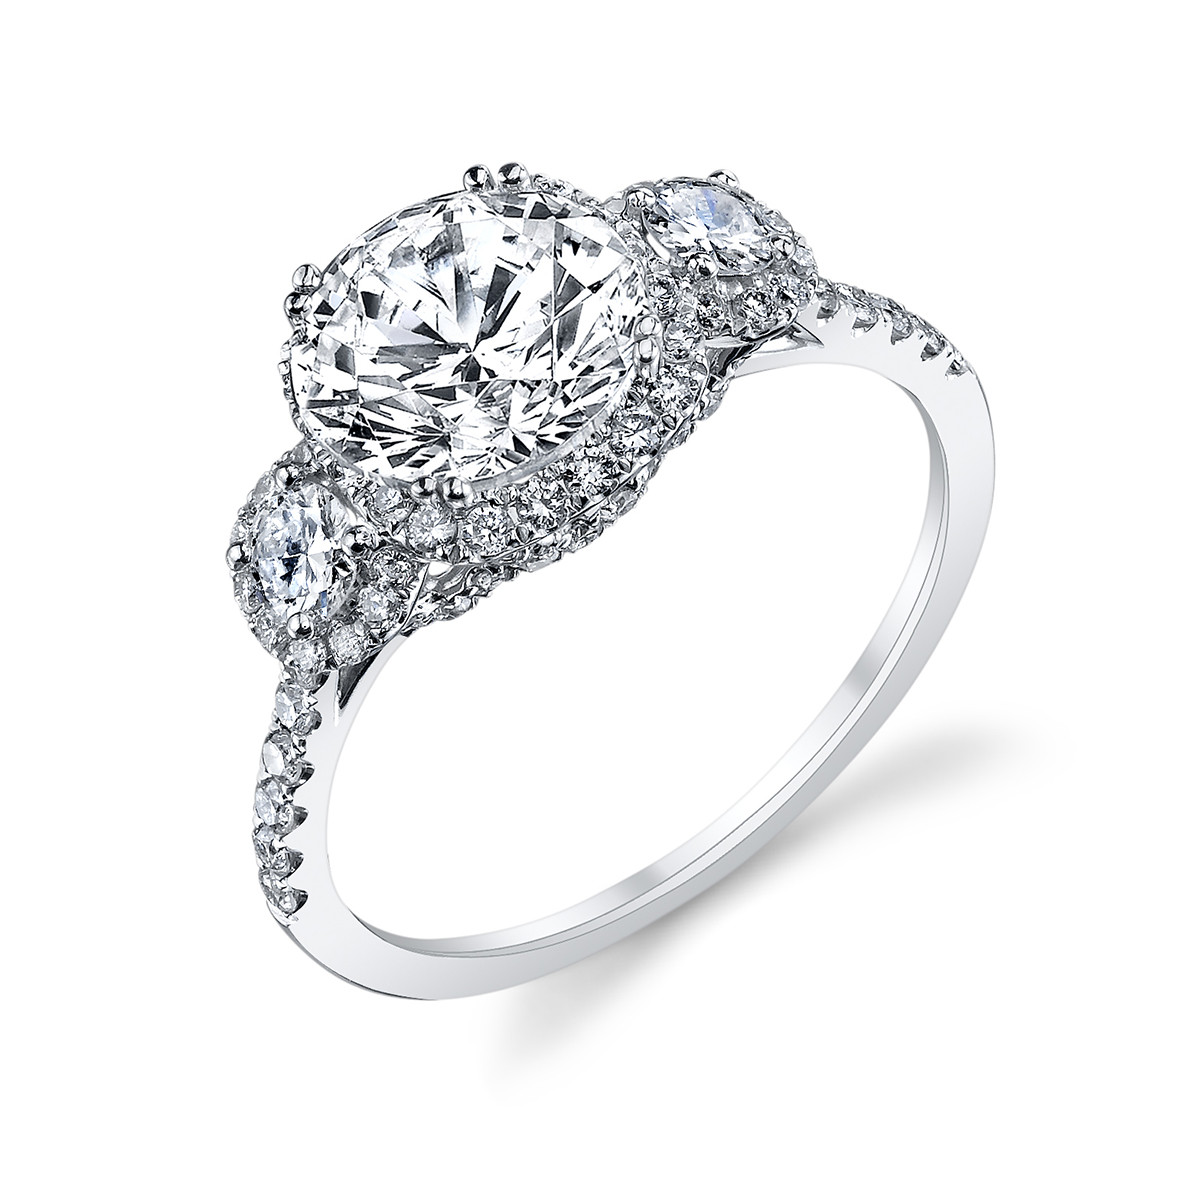 New Venetti 0.72 CTW Diamond Halo Ring Setting